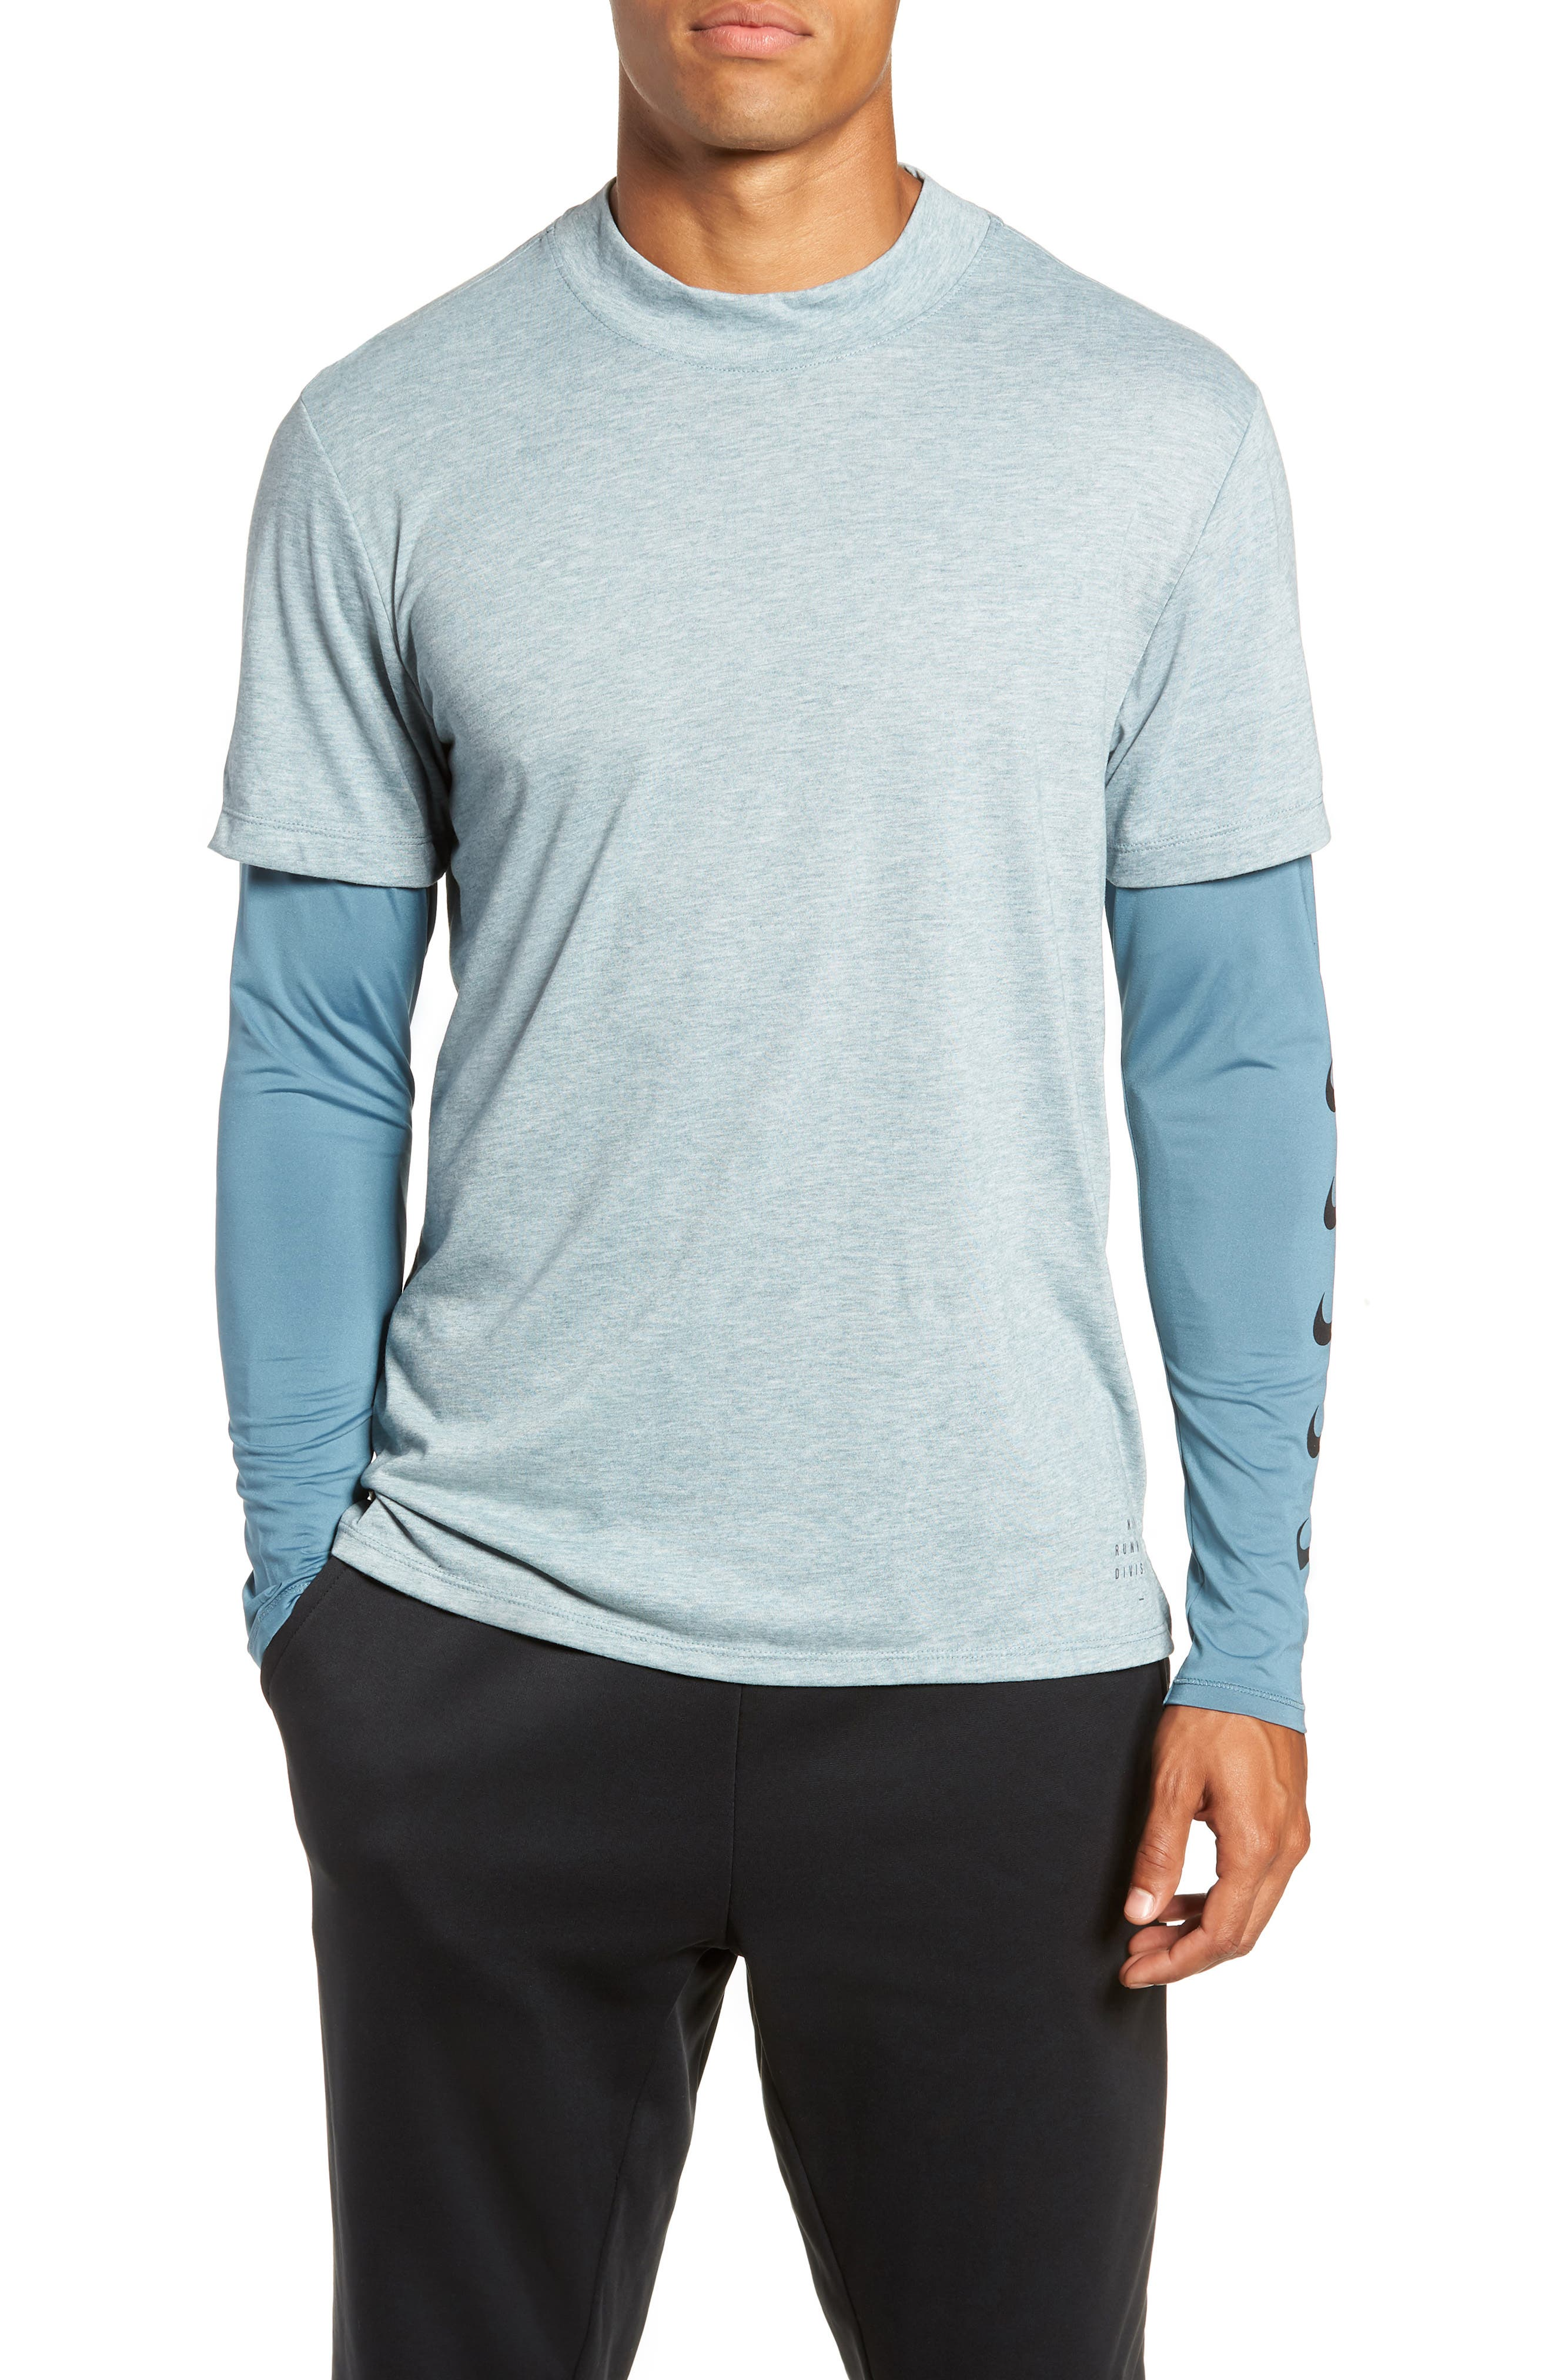 Nike Breathe Rise 365 Layered Long Sleeve T-Shirt Blue/green